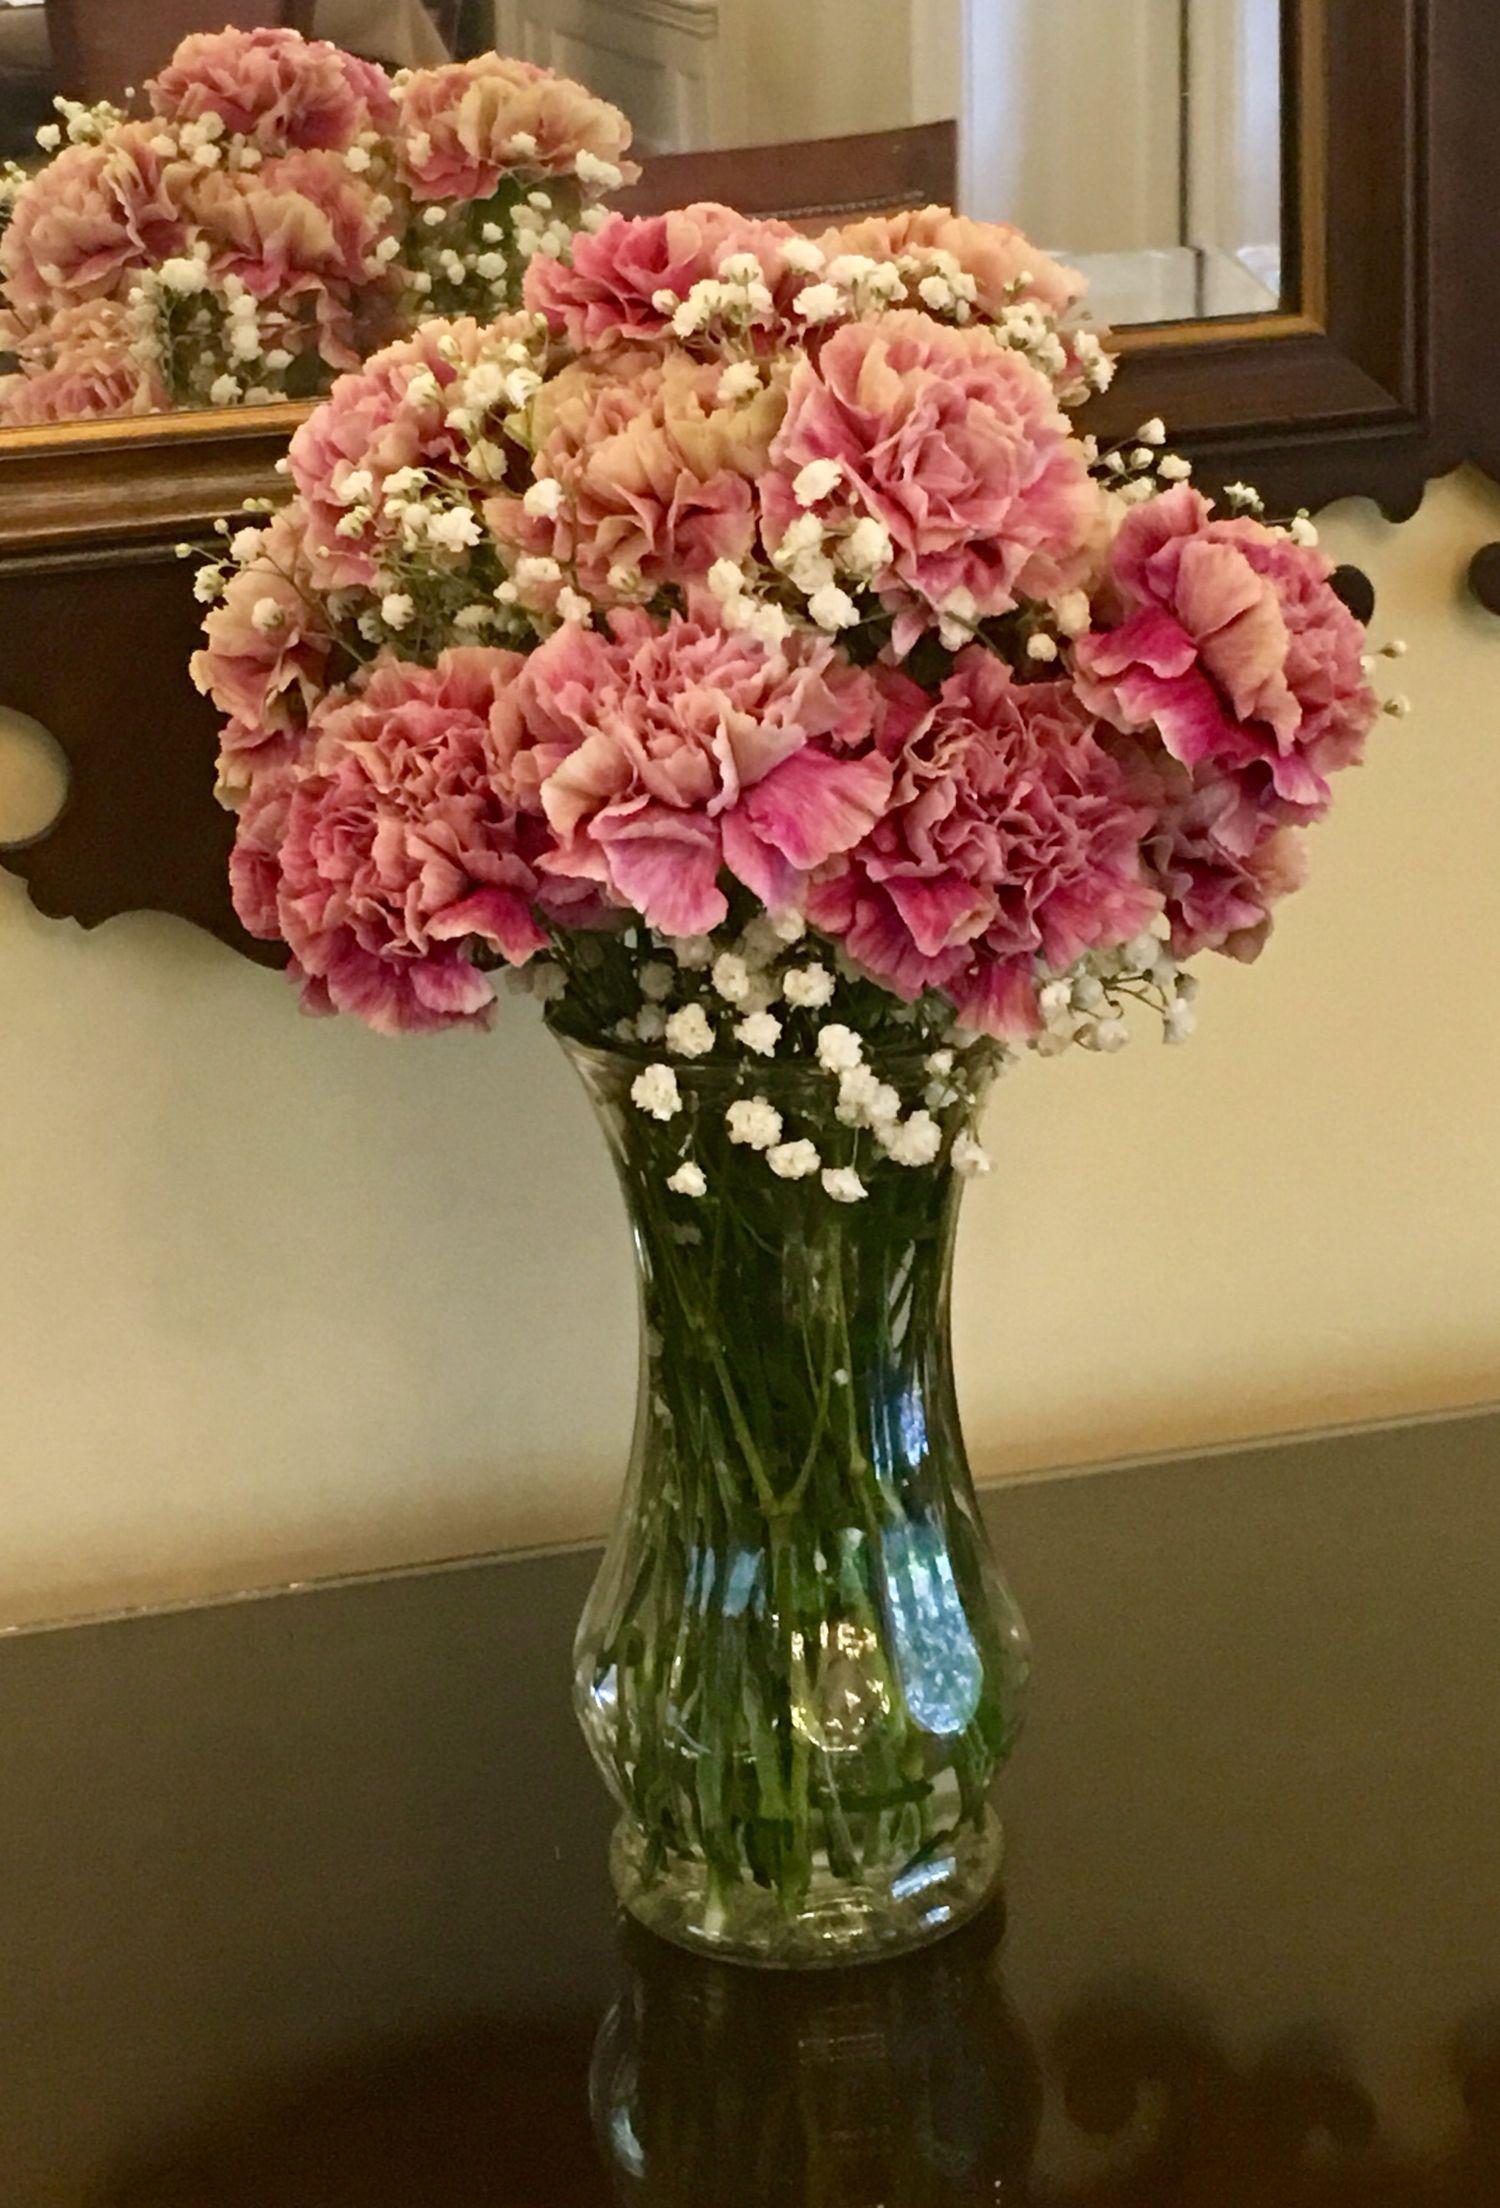 Pin by Teresa B on Flowers | Decor, Home decor, Flowers